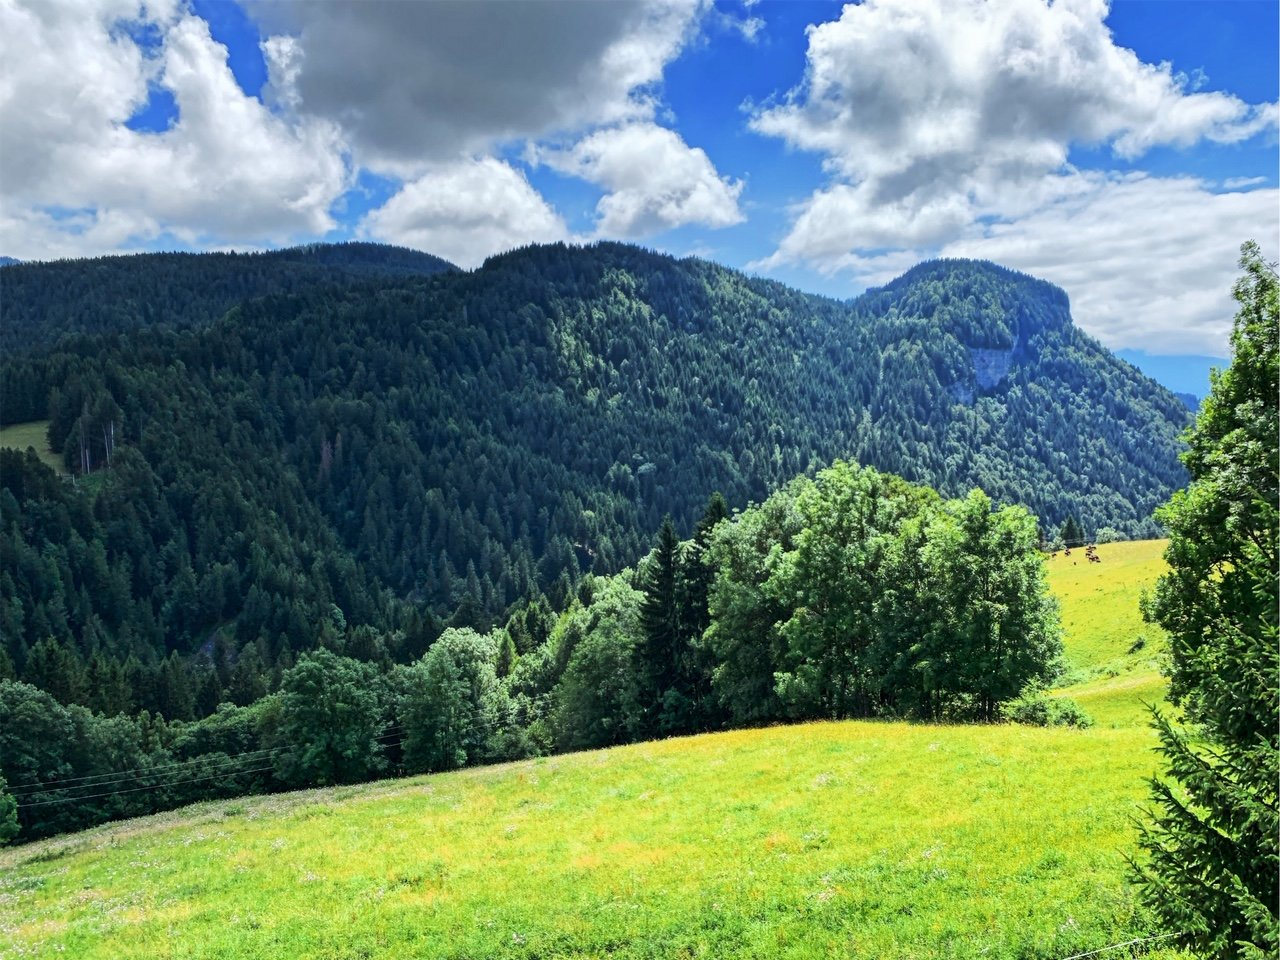 View to Rocher du Mais